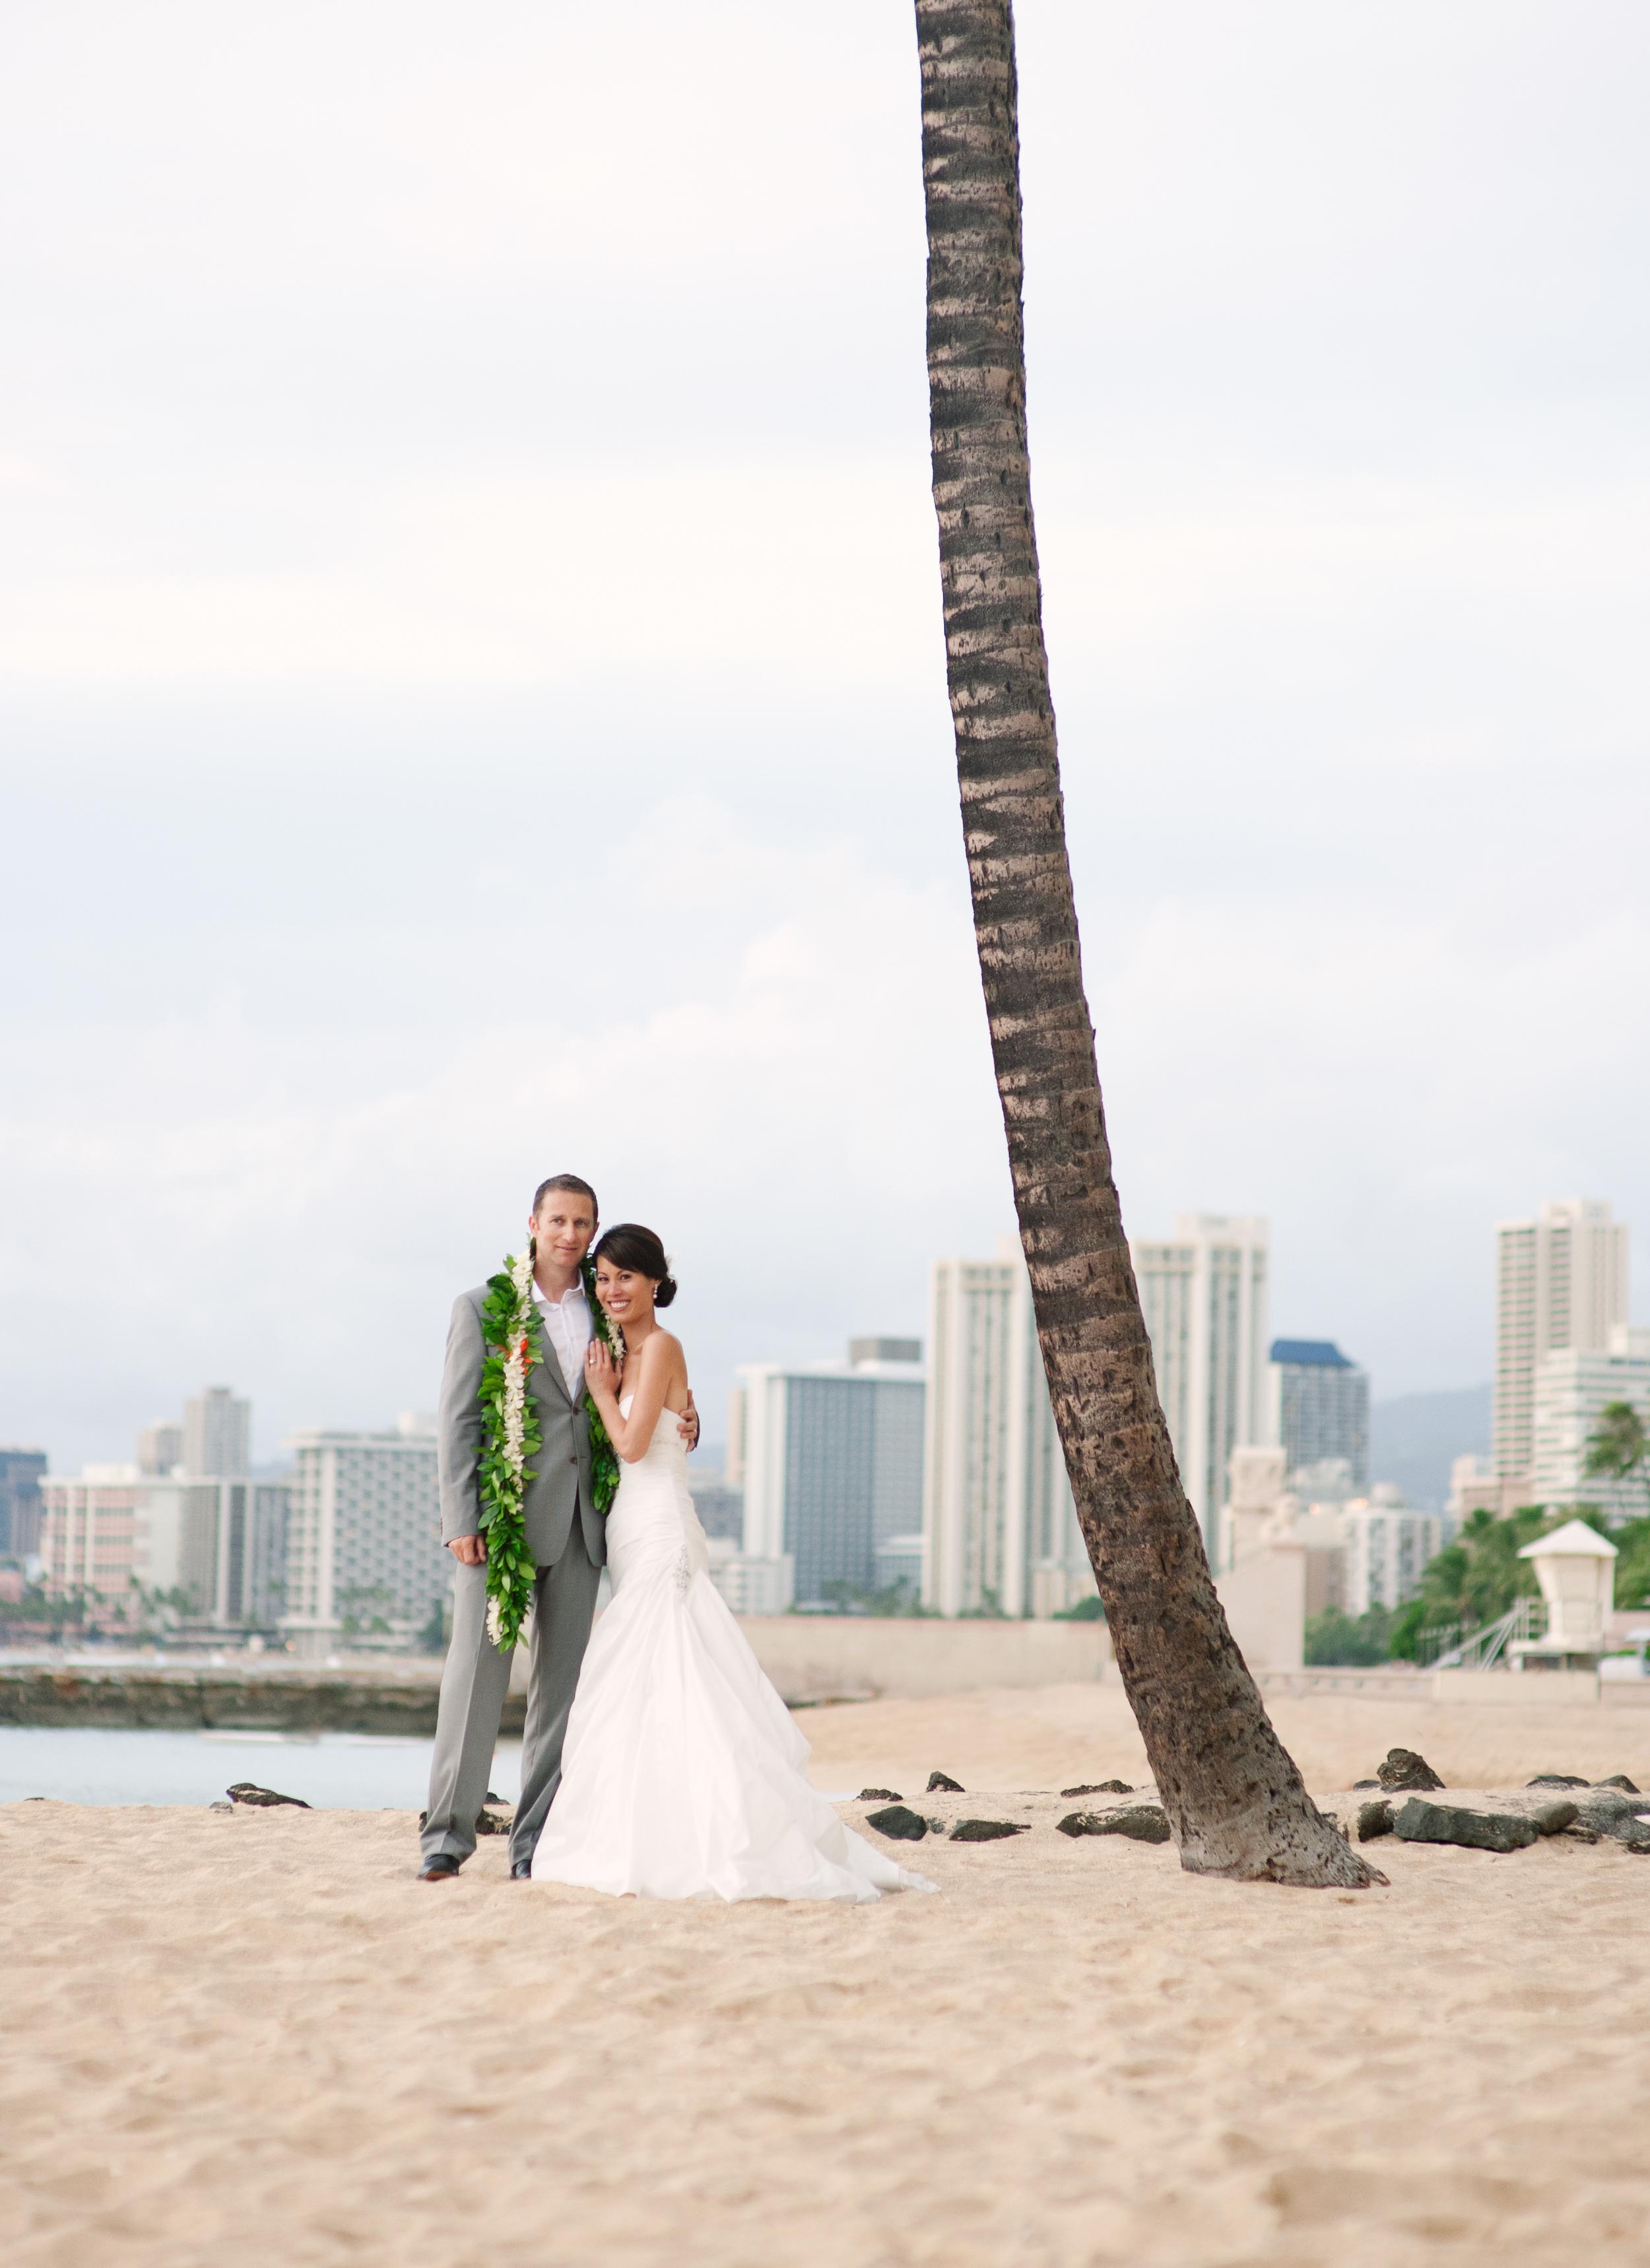 seattle-wedding-photographer-10-2.jpg